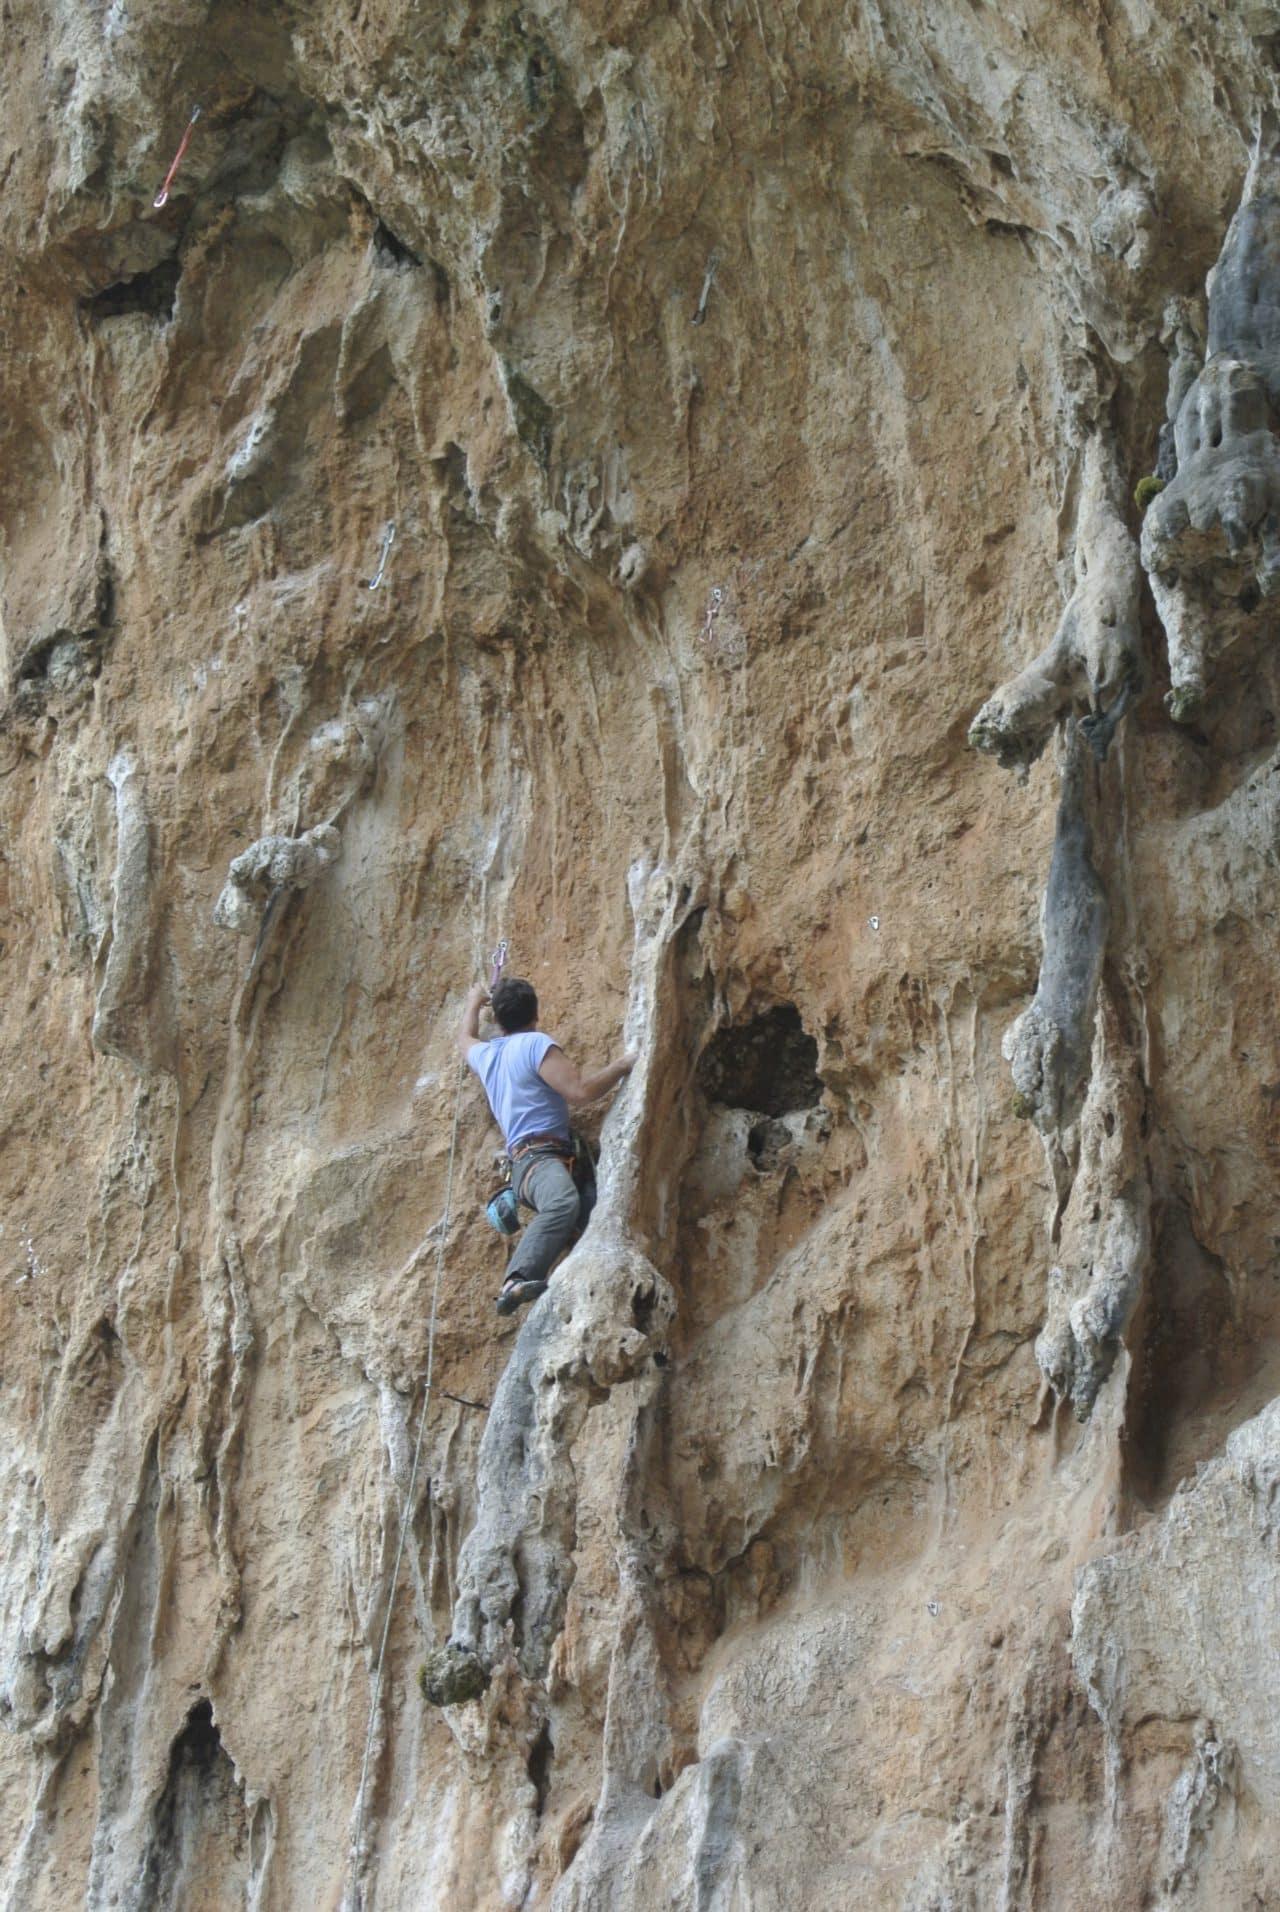 escalade-grece-athenes-philippe-mailhot-guide-de-montagne-helyum